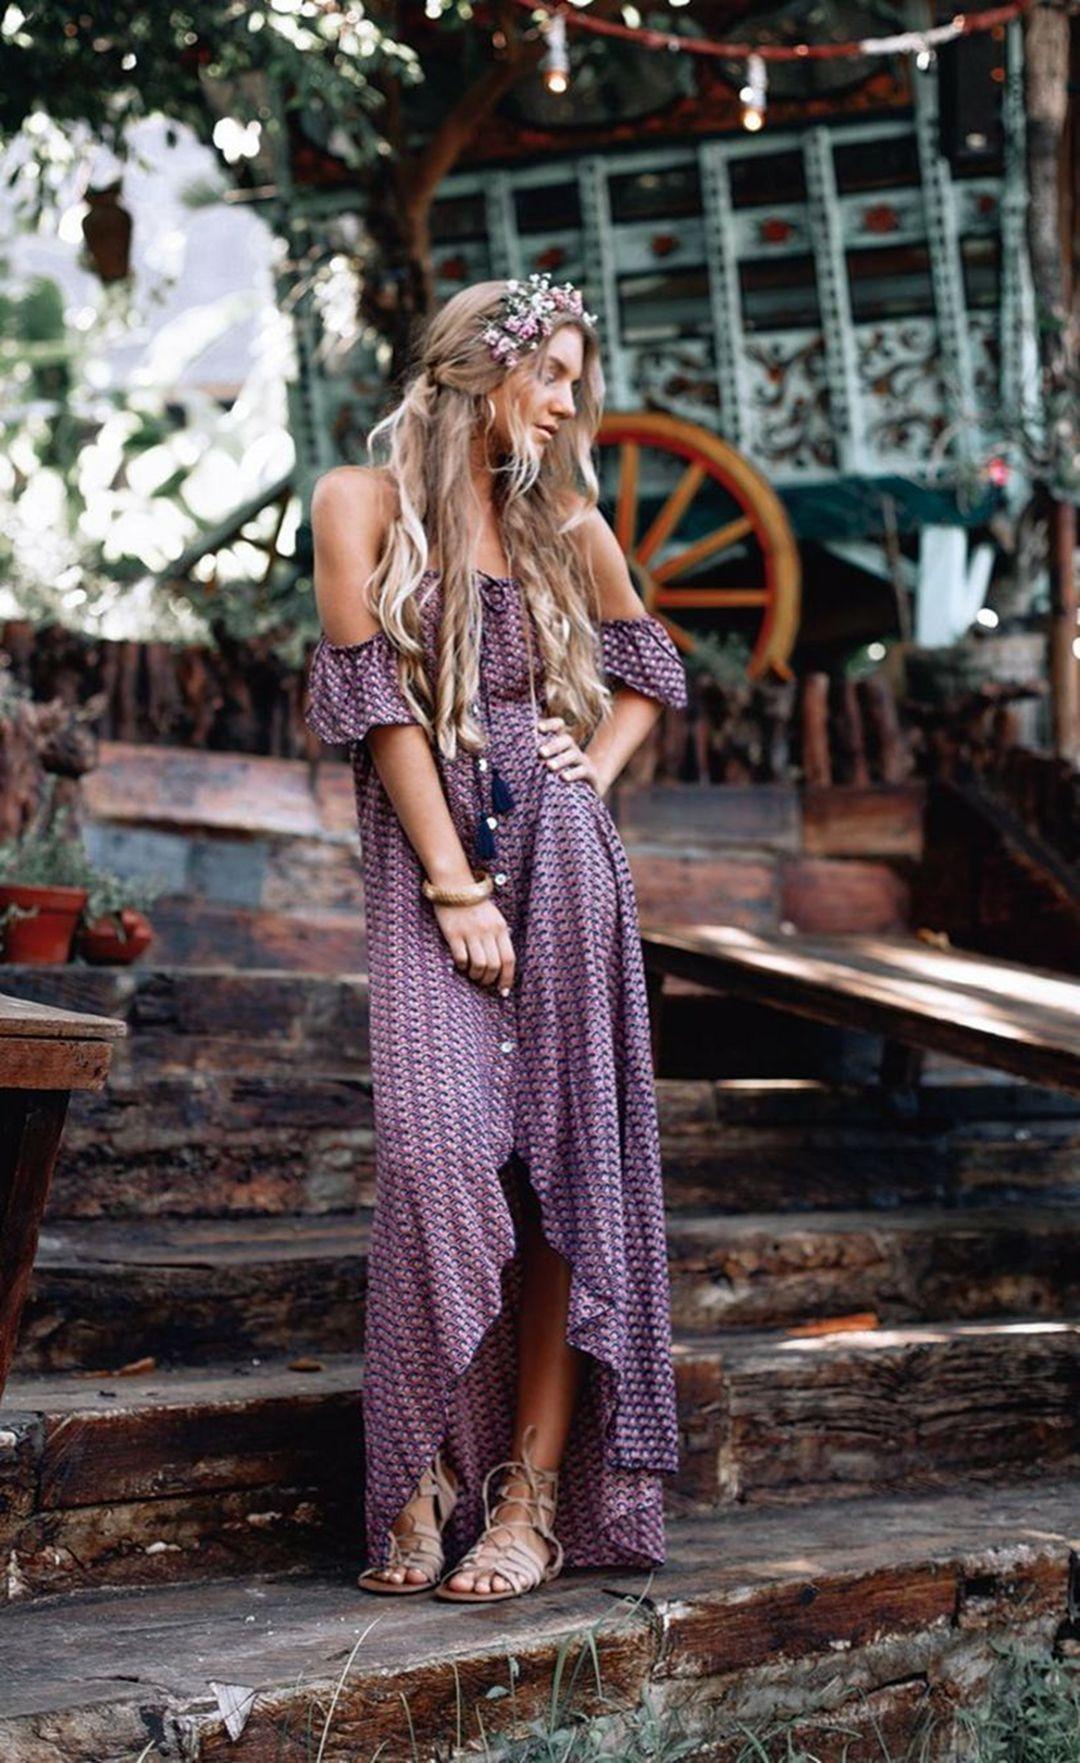 12 Cozy Bohemian Dress Ideas For Women To Look Charming Enjoying A Sweet Summer Fashions Nowadays Bohemian Style Clothing Boho Outfits Beautiful Boho Dresses [ 1763 x 1080 Pixel ]